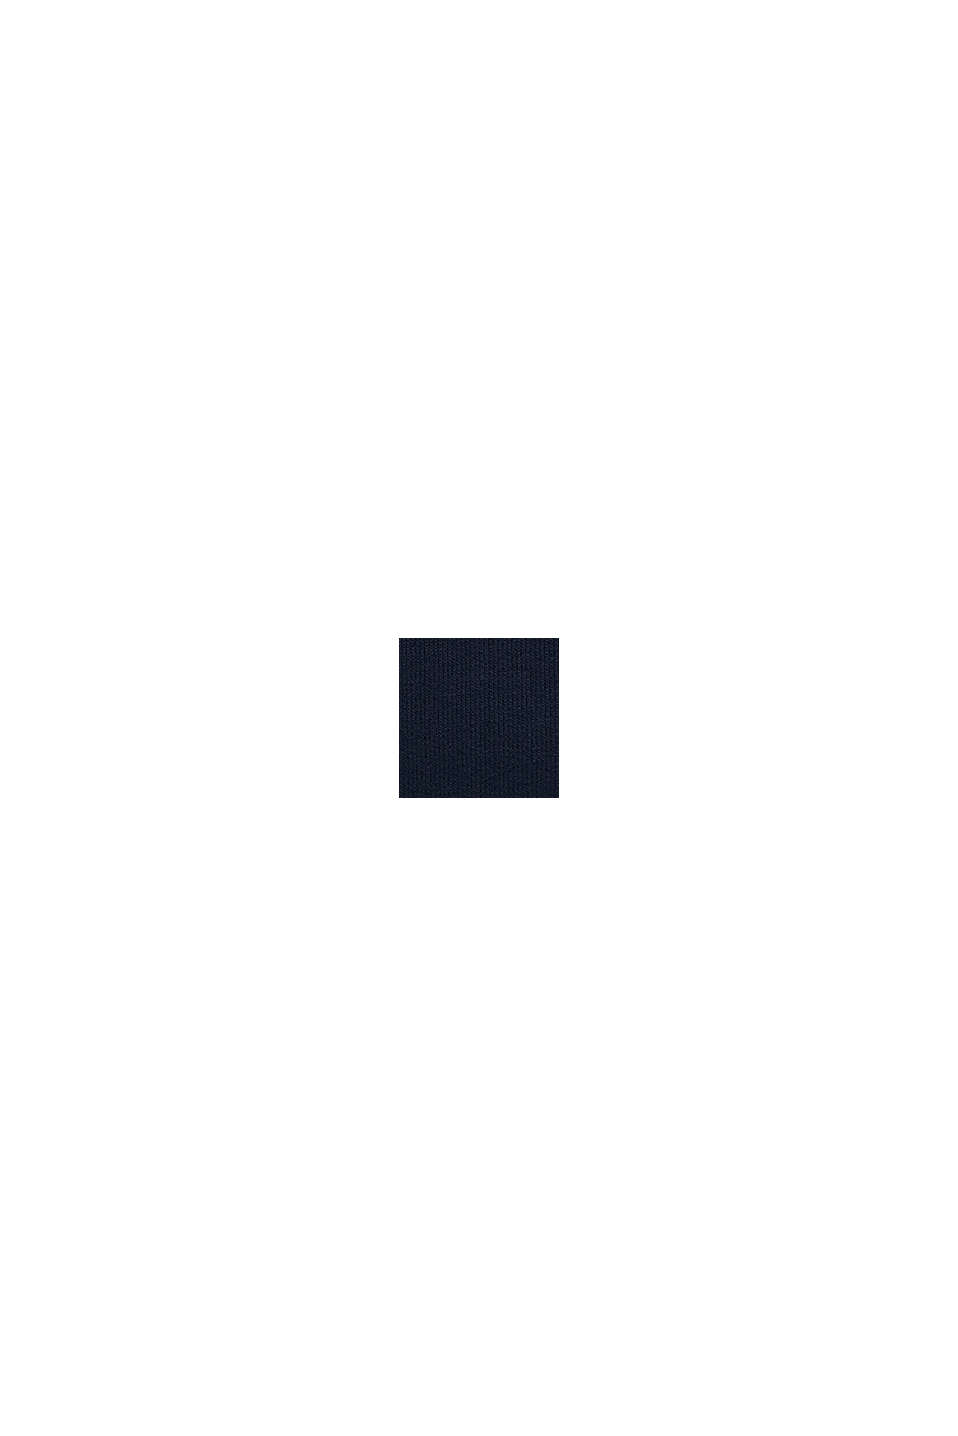 Hoodie met logo, 100% katoen, NAVY, swatch